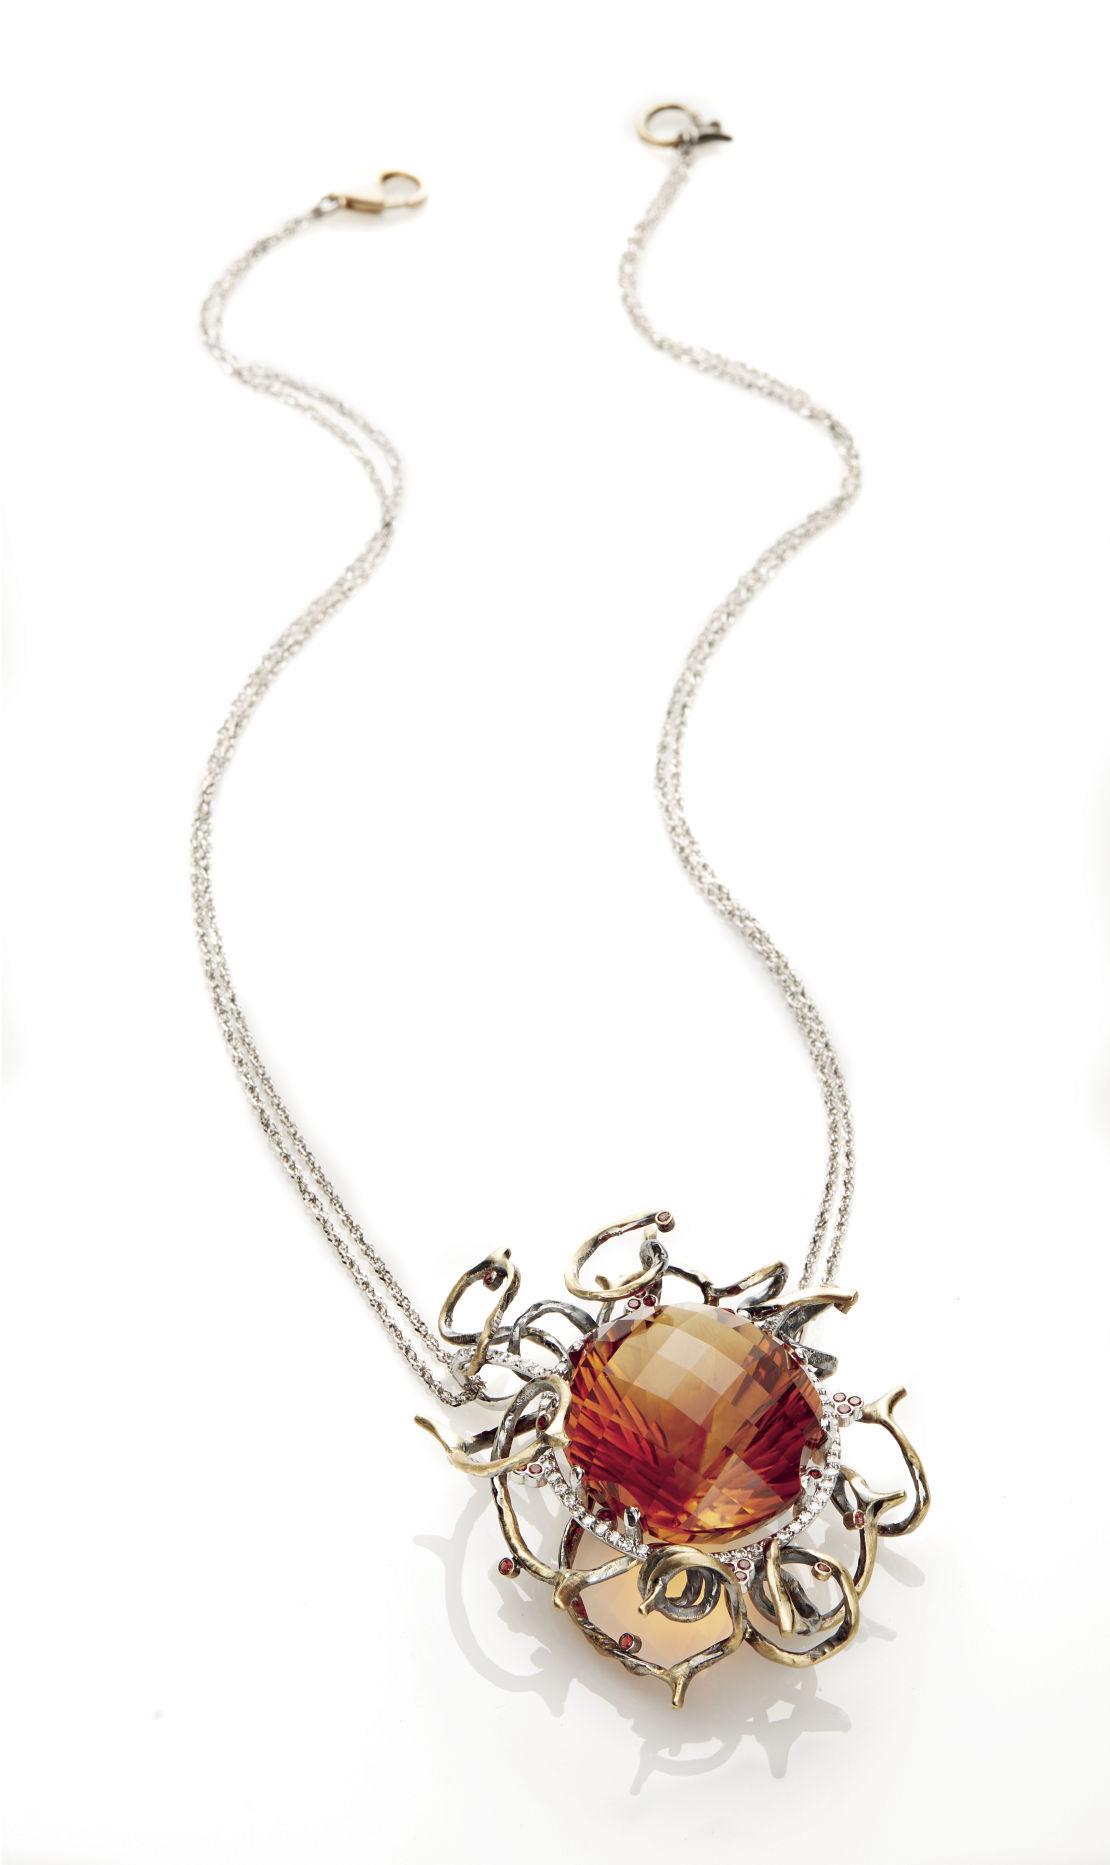 adam foster jewelry